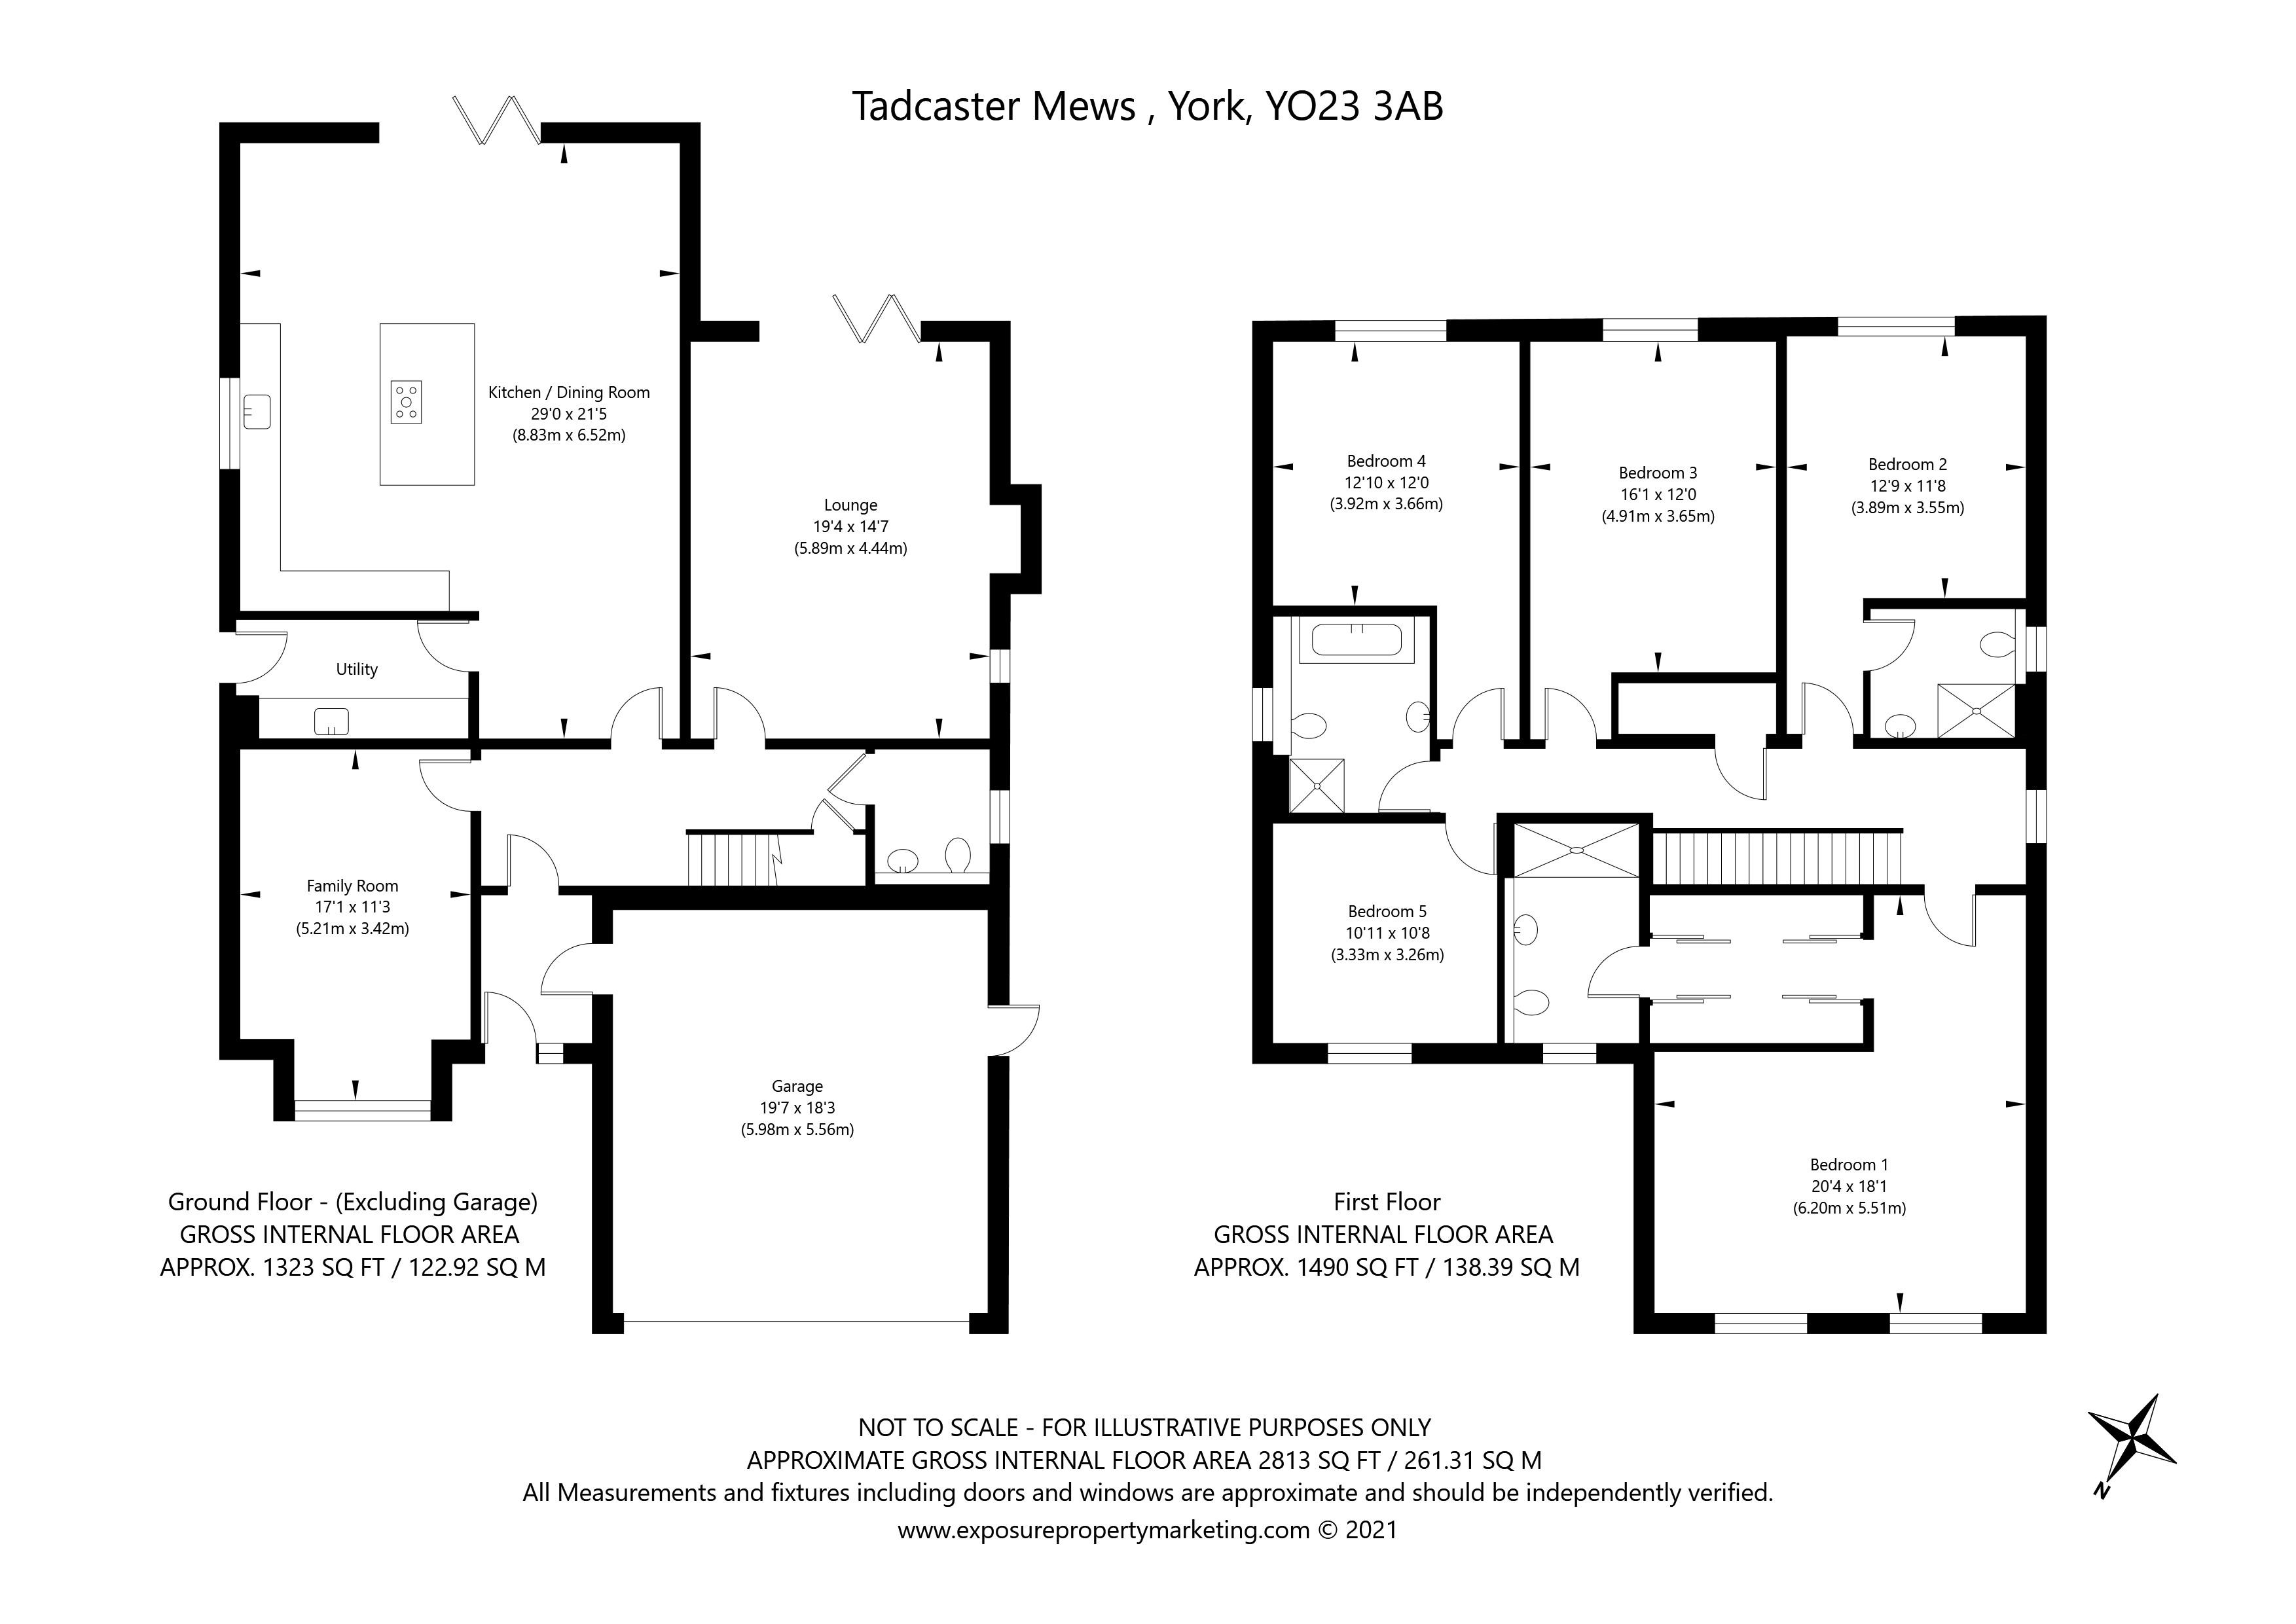 Hallcroft House, Tadcaster Mews, Copmanthorpe, York property floorplan